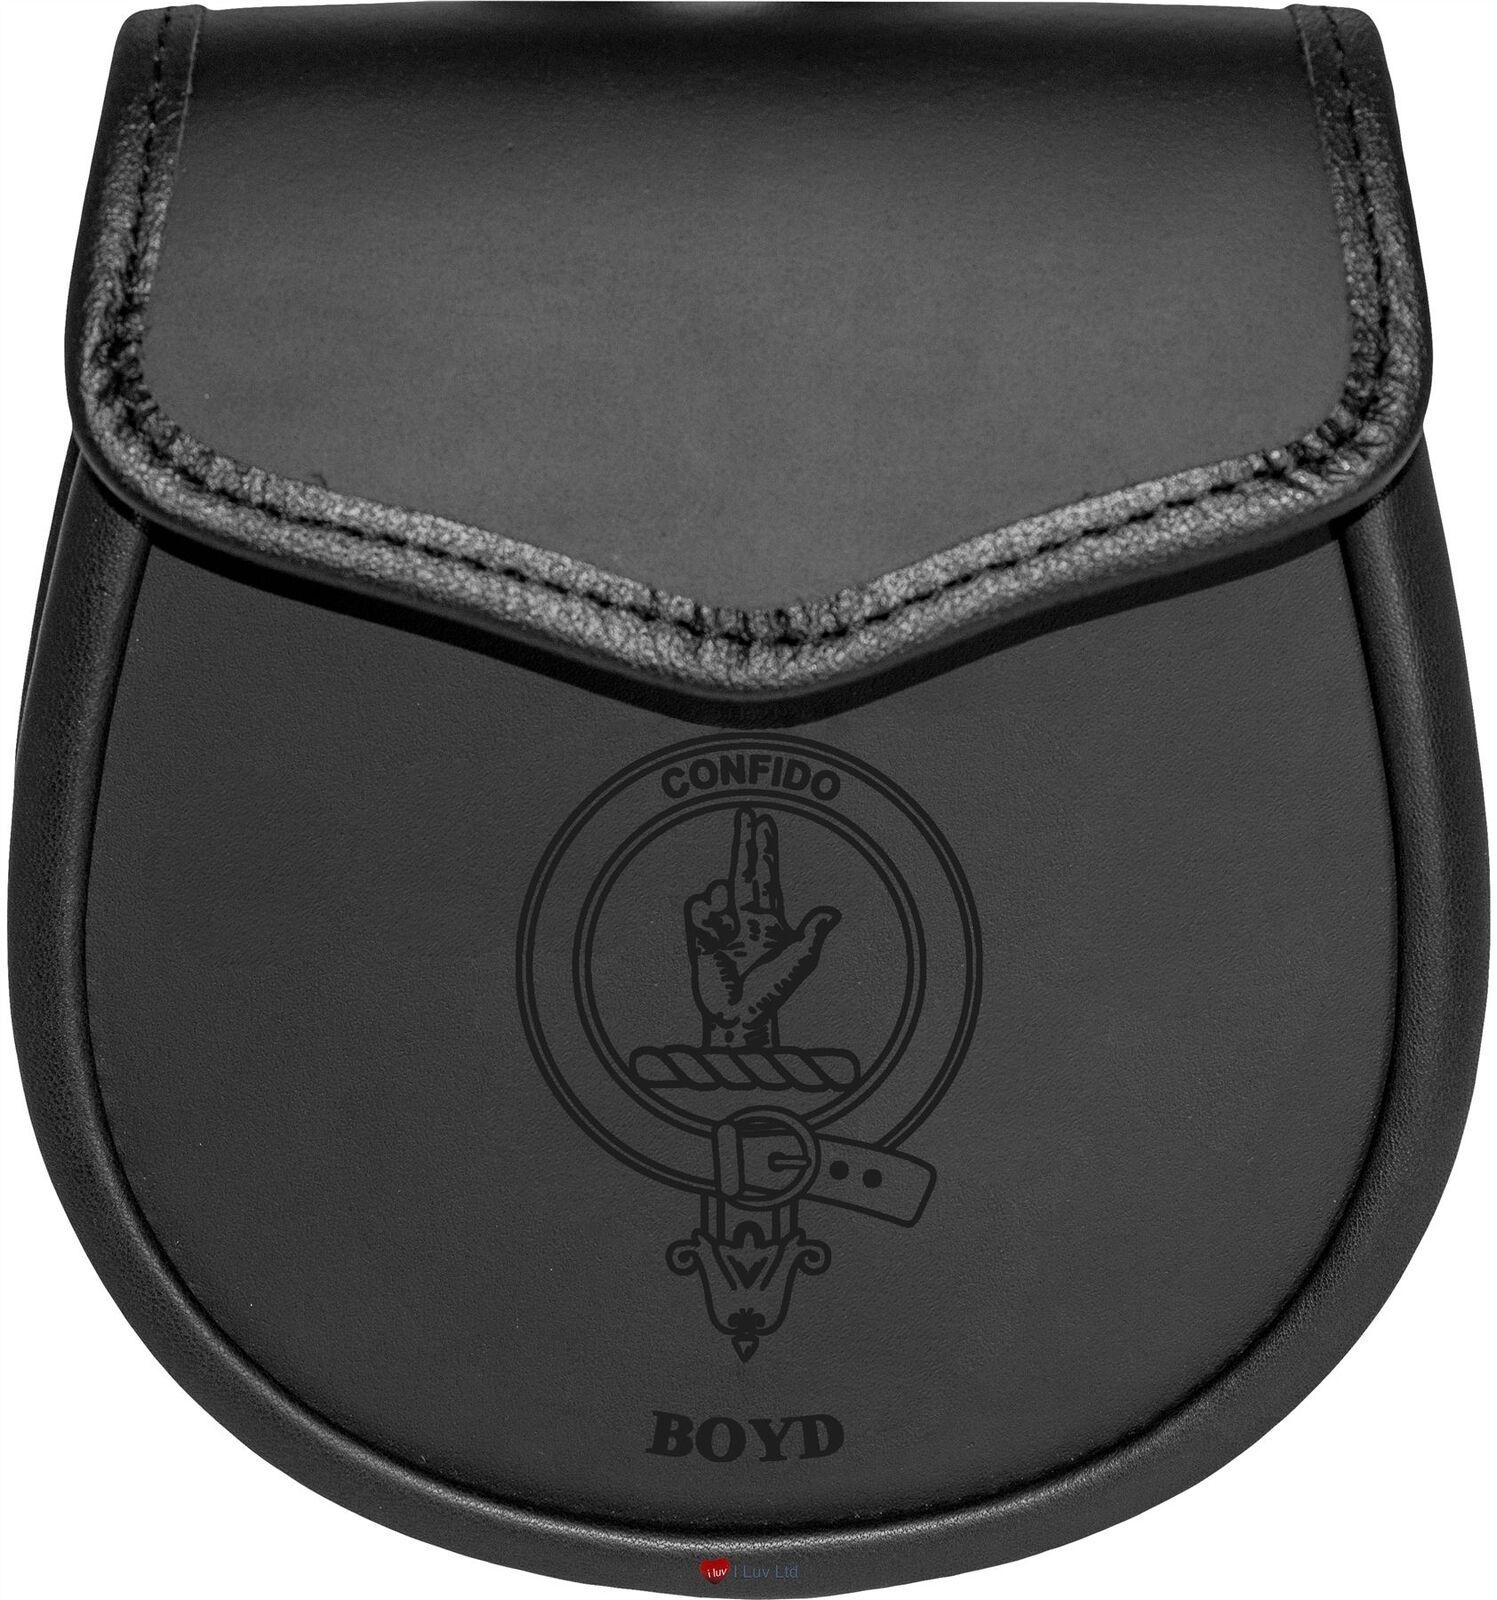 Boyd Leather Day Sporran Scottish Clan Crest